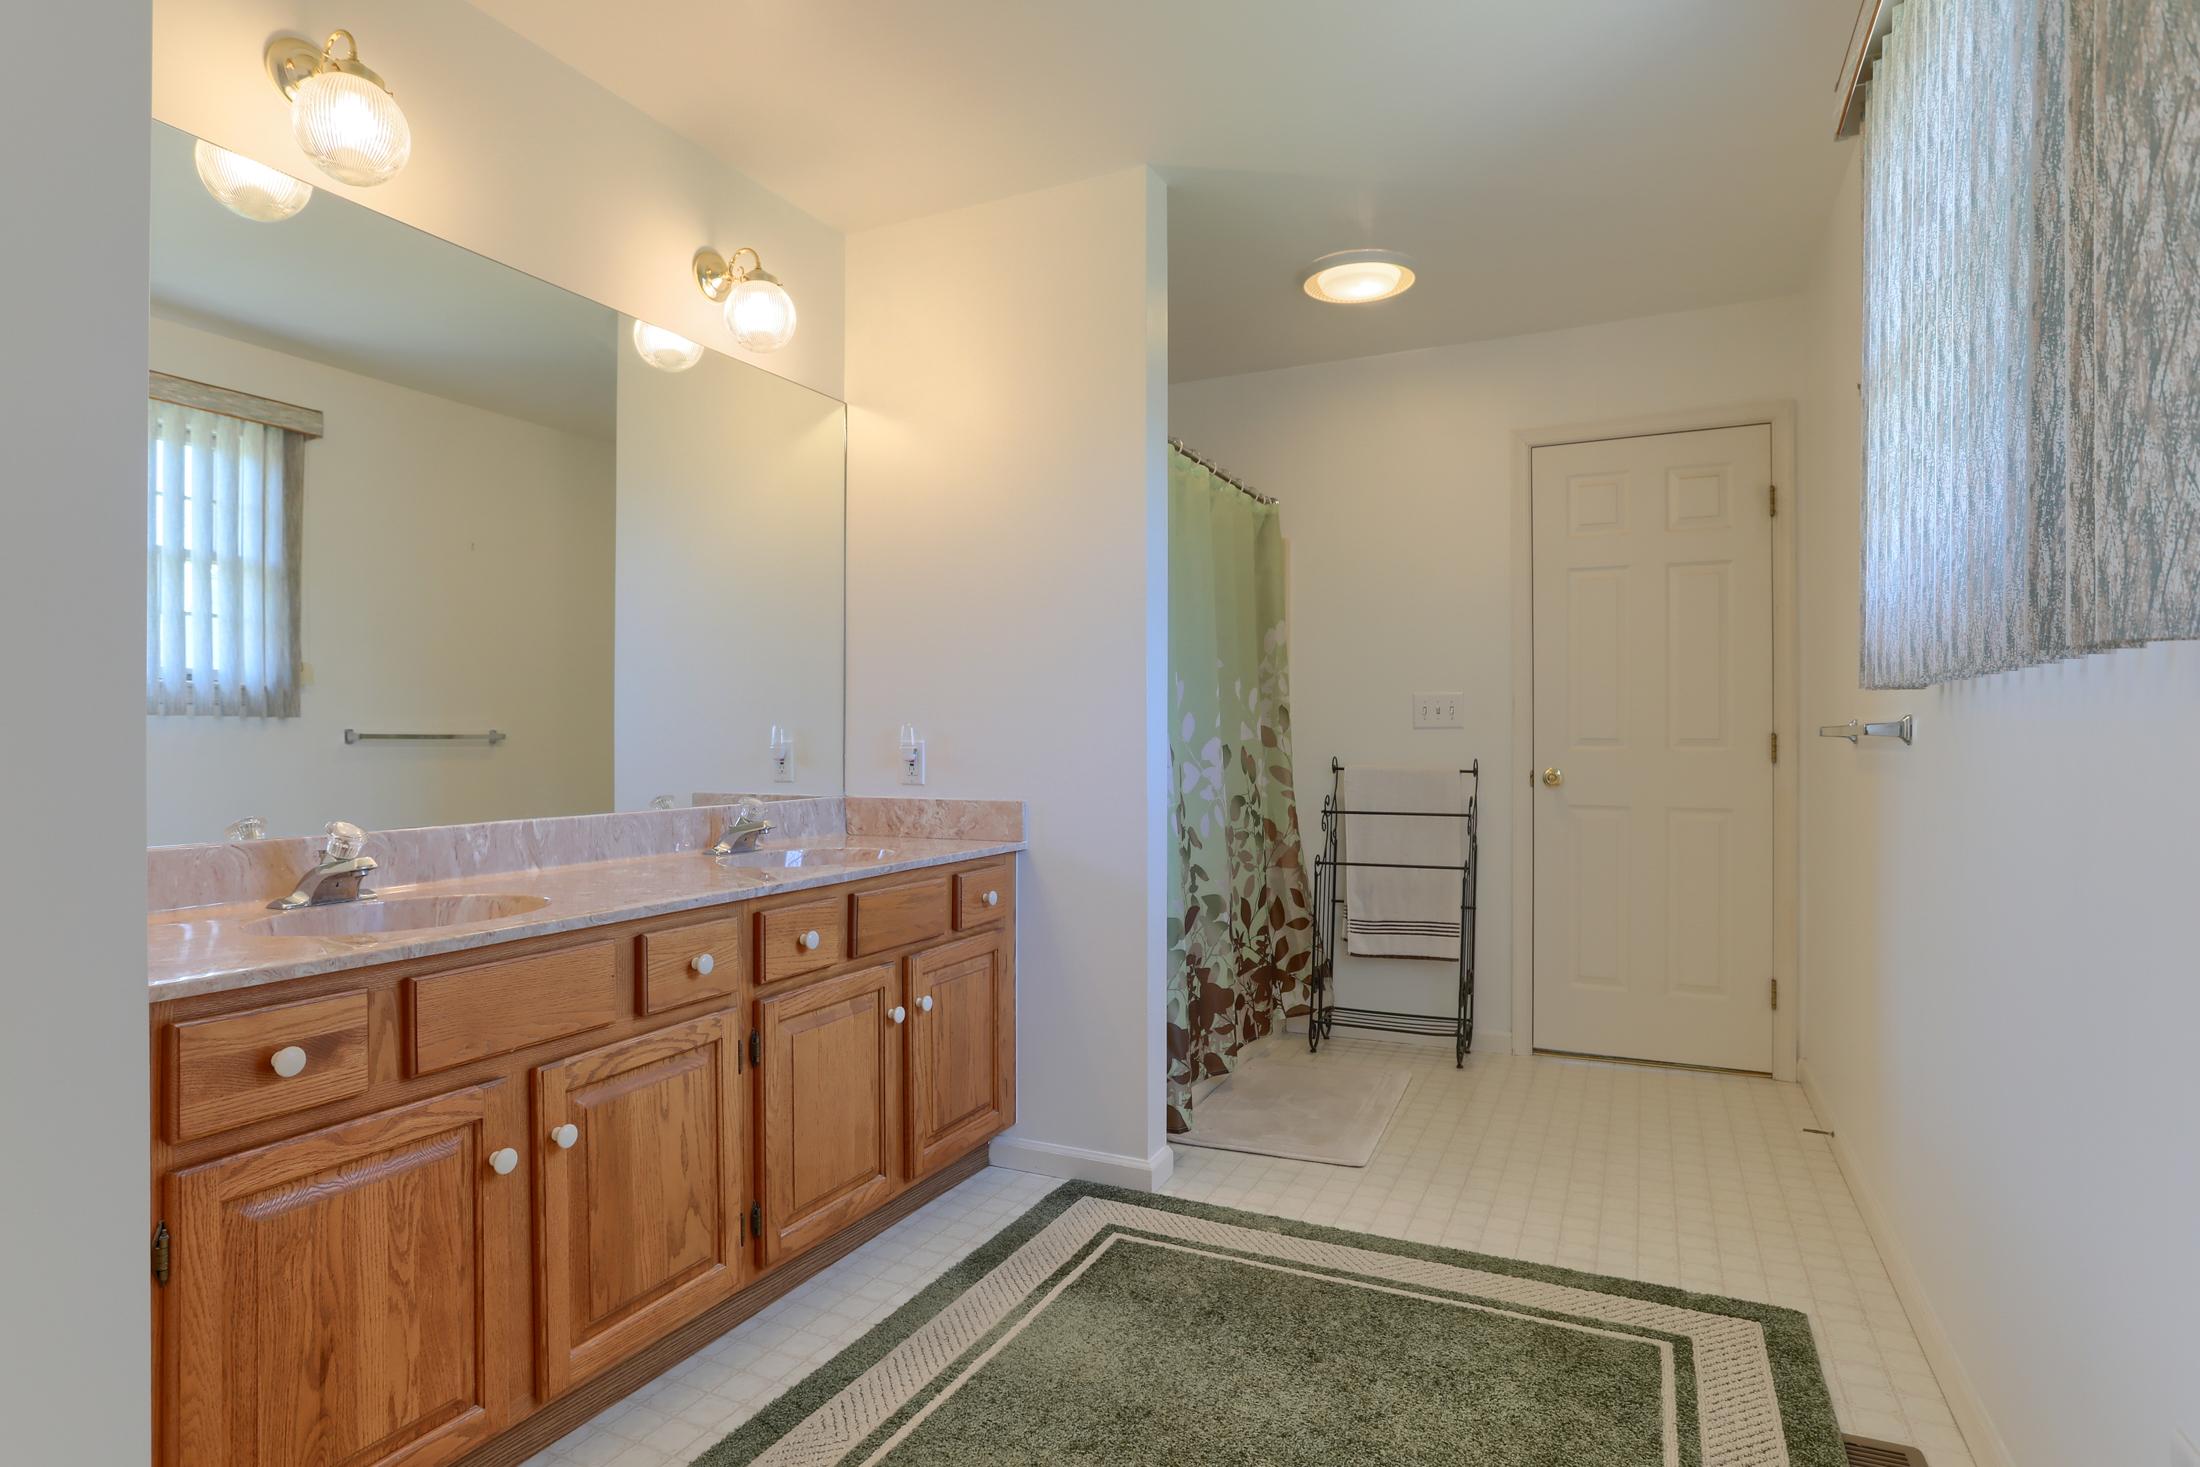 26 W. Strack Drive - Bathroom